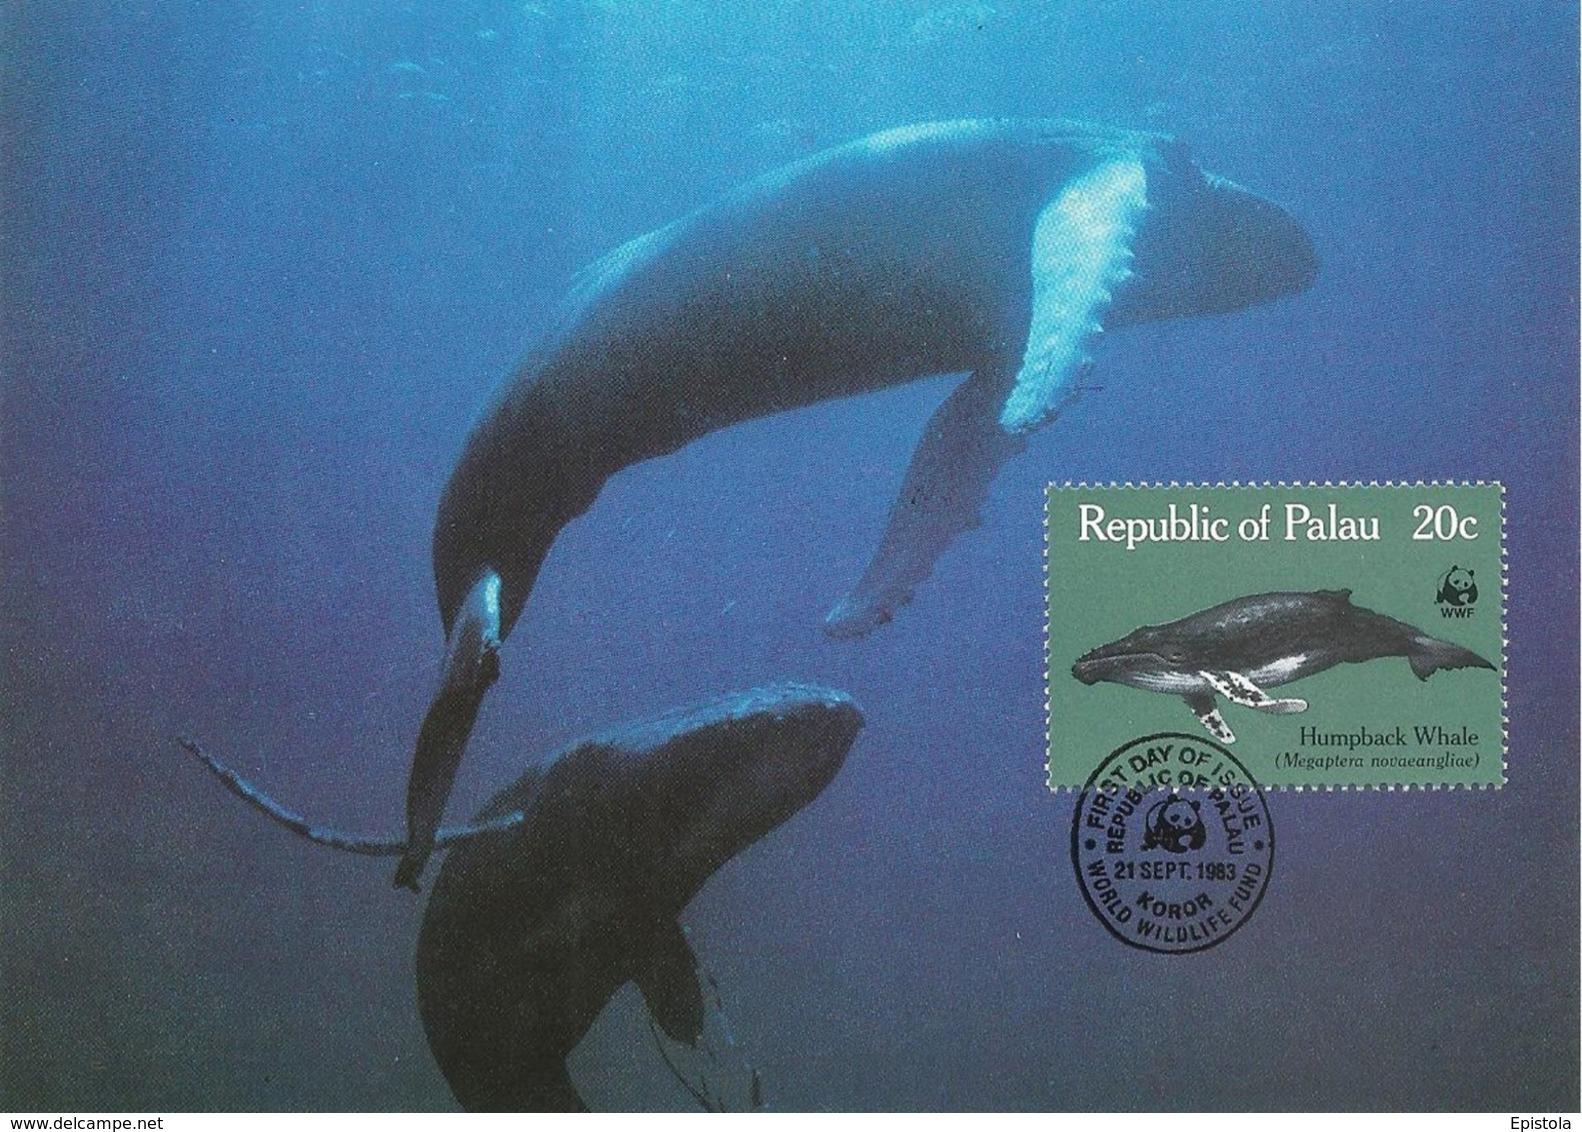 1983 - PALAU (Belau Ou Pelew) - Humpback Whale - Baleine à Bosse WWF - Palau